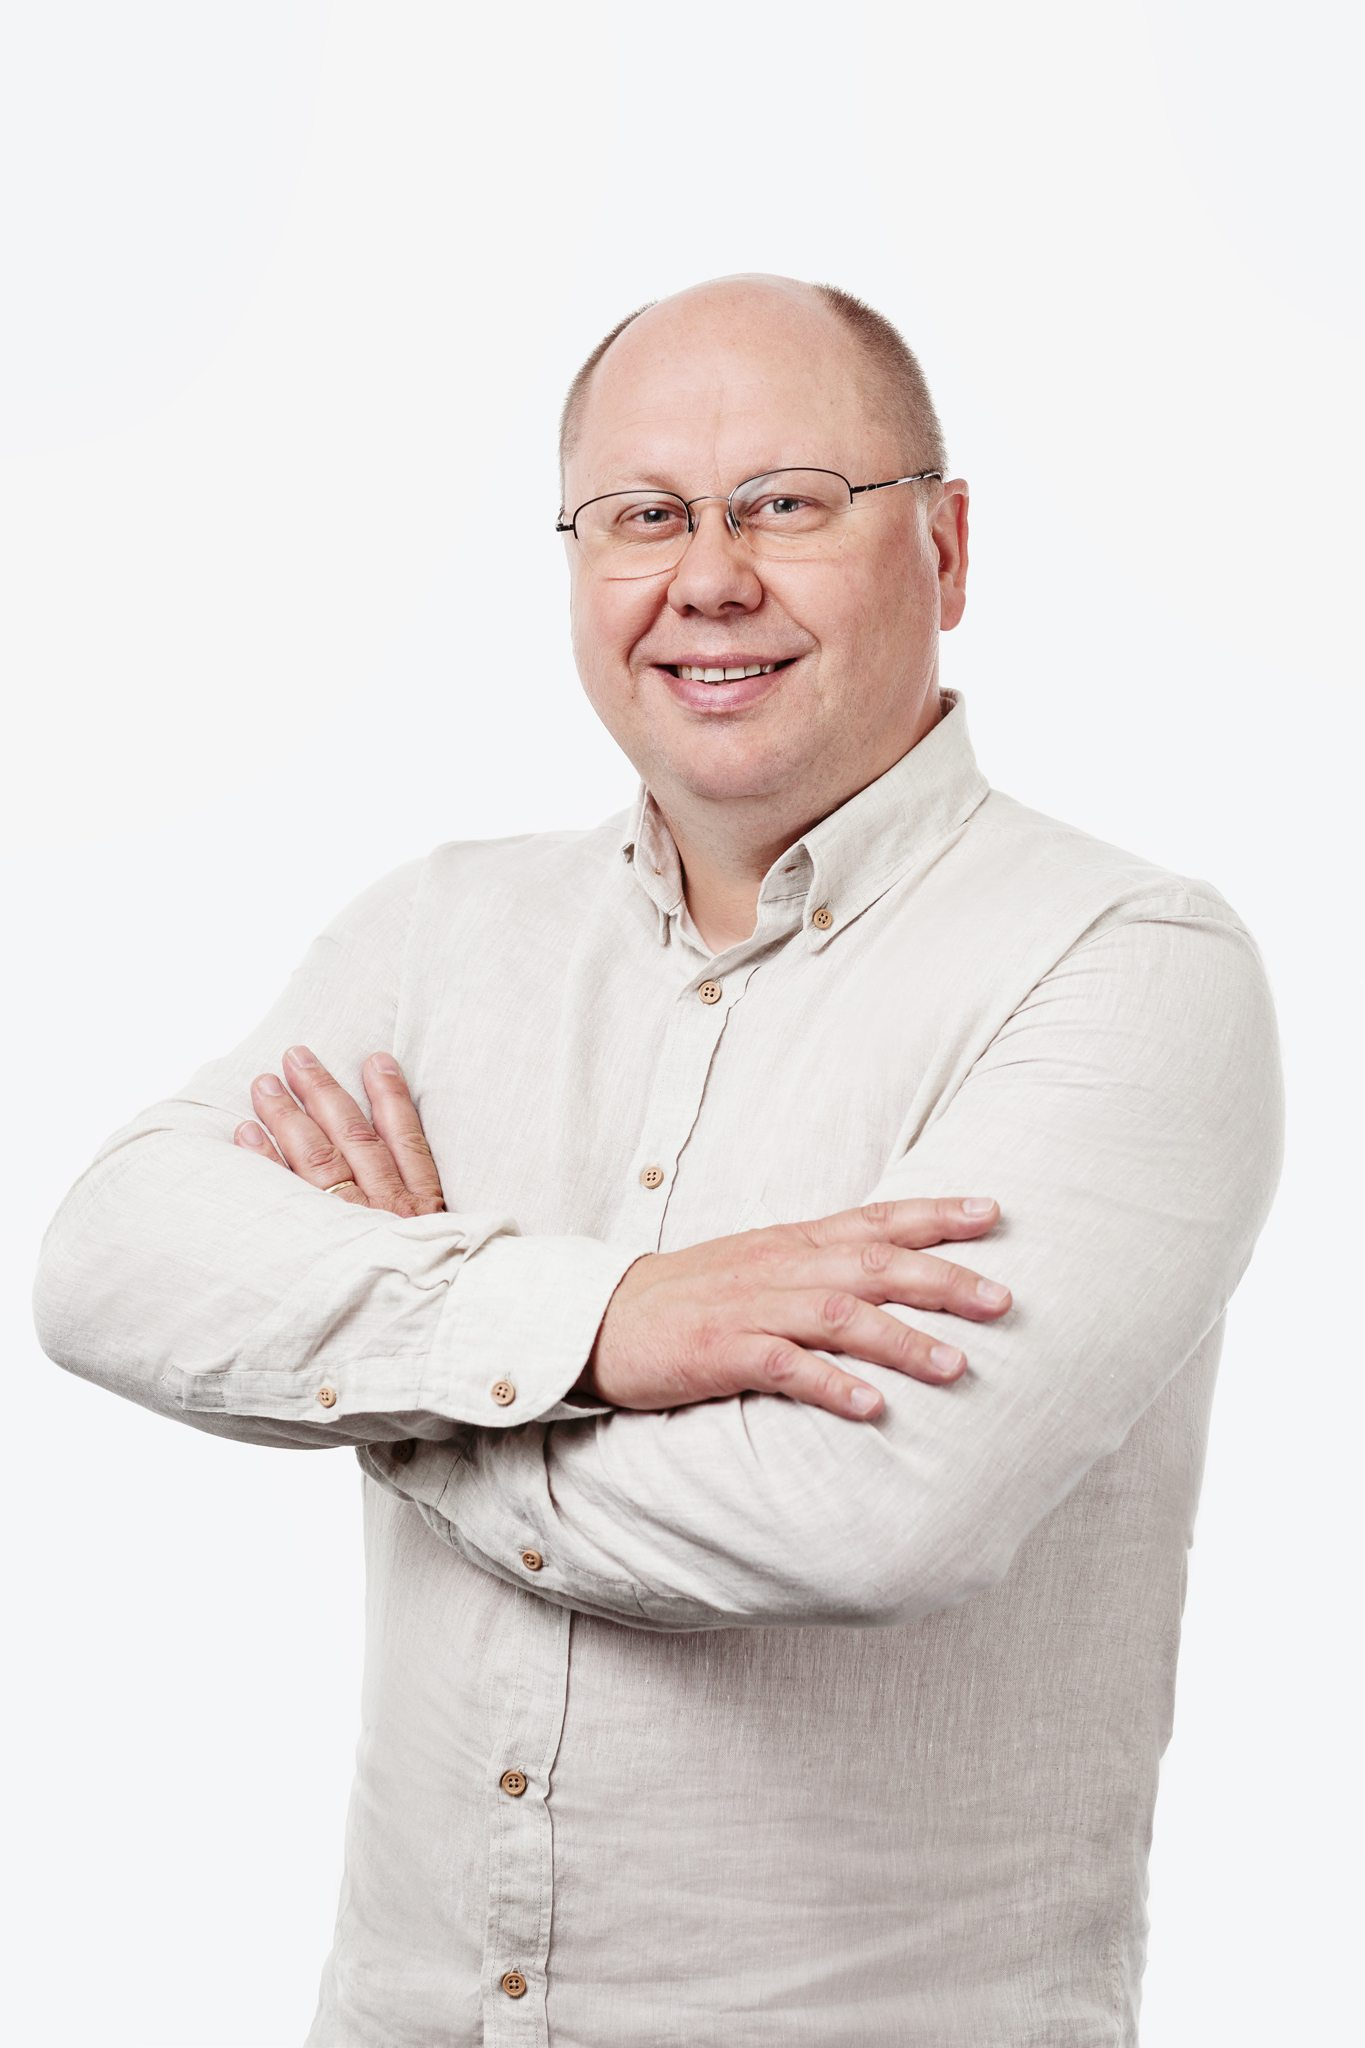 Karol Dudij